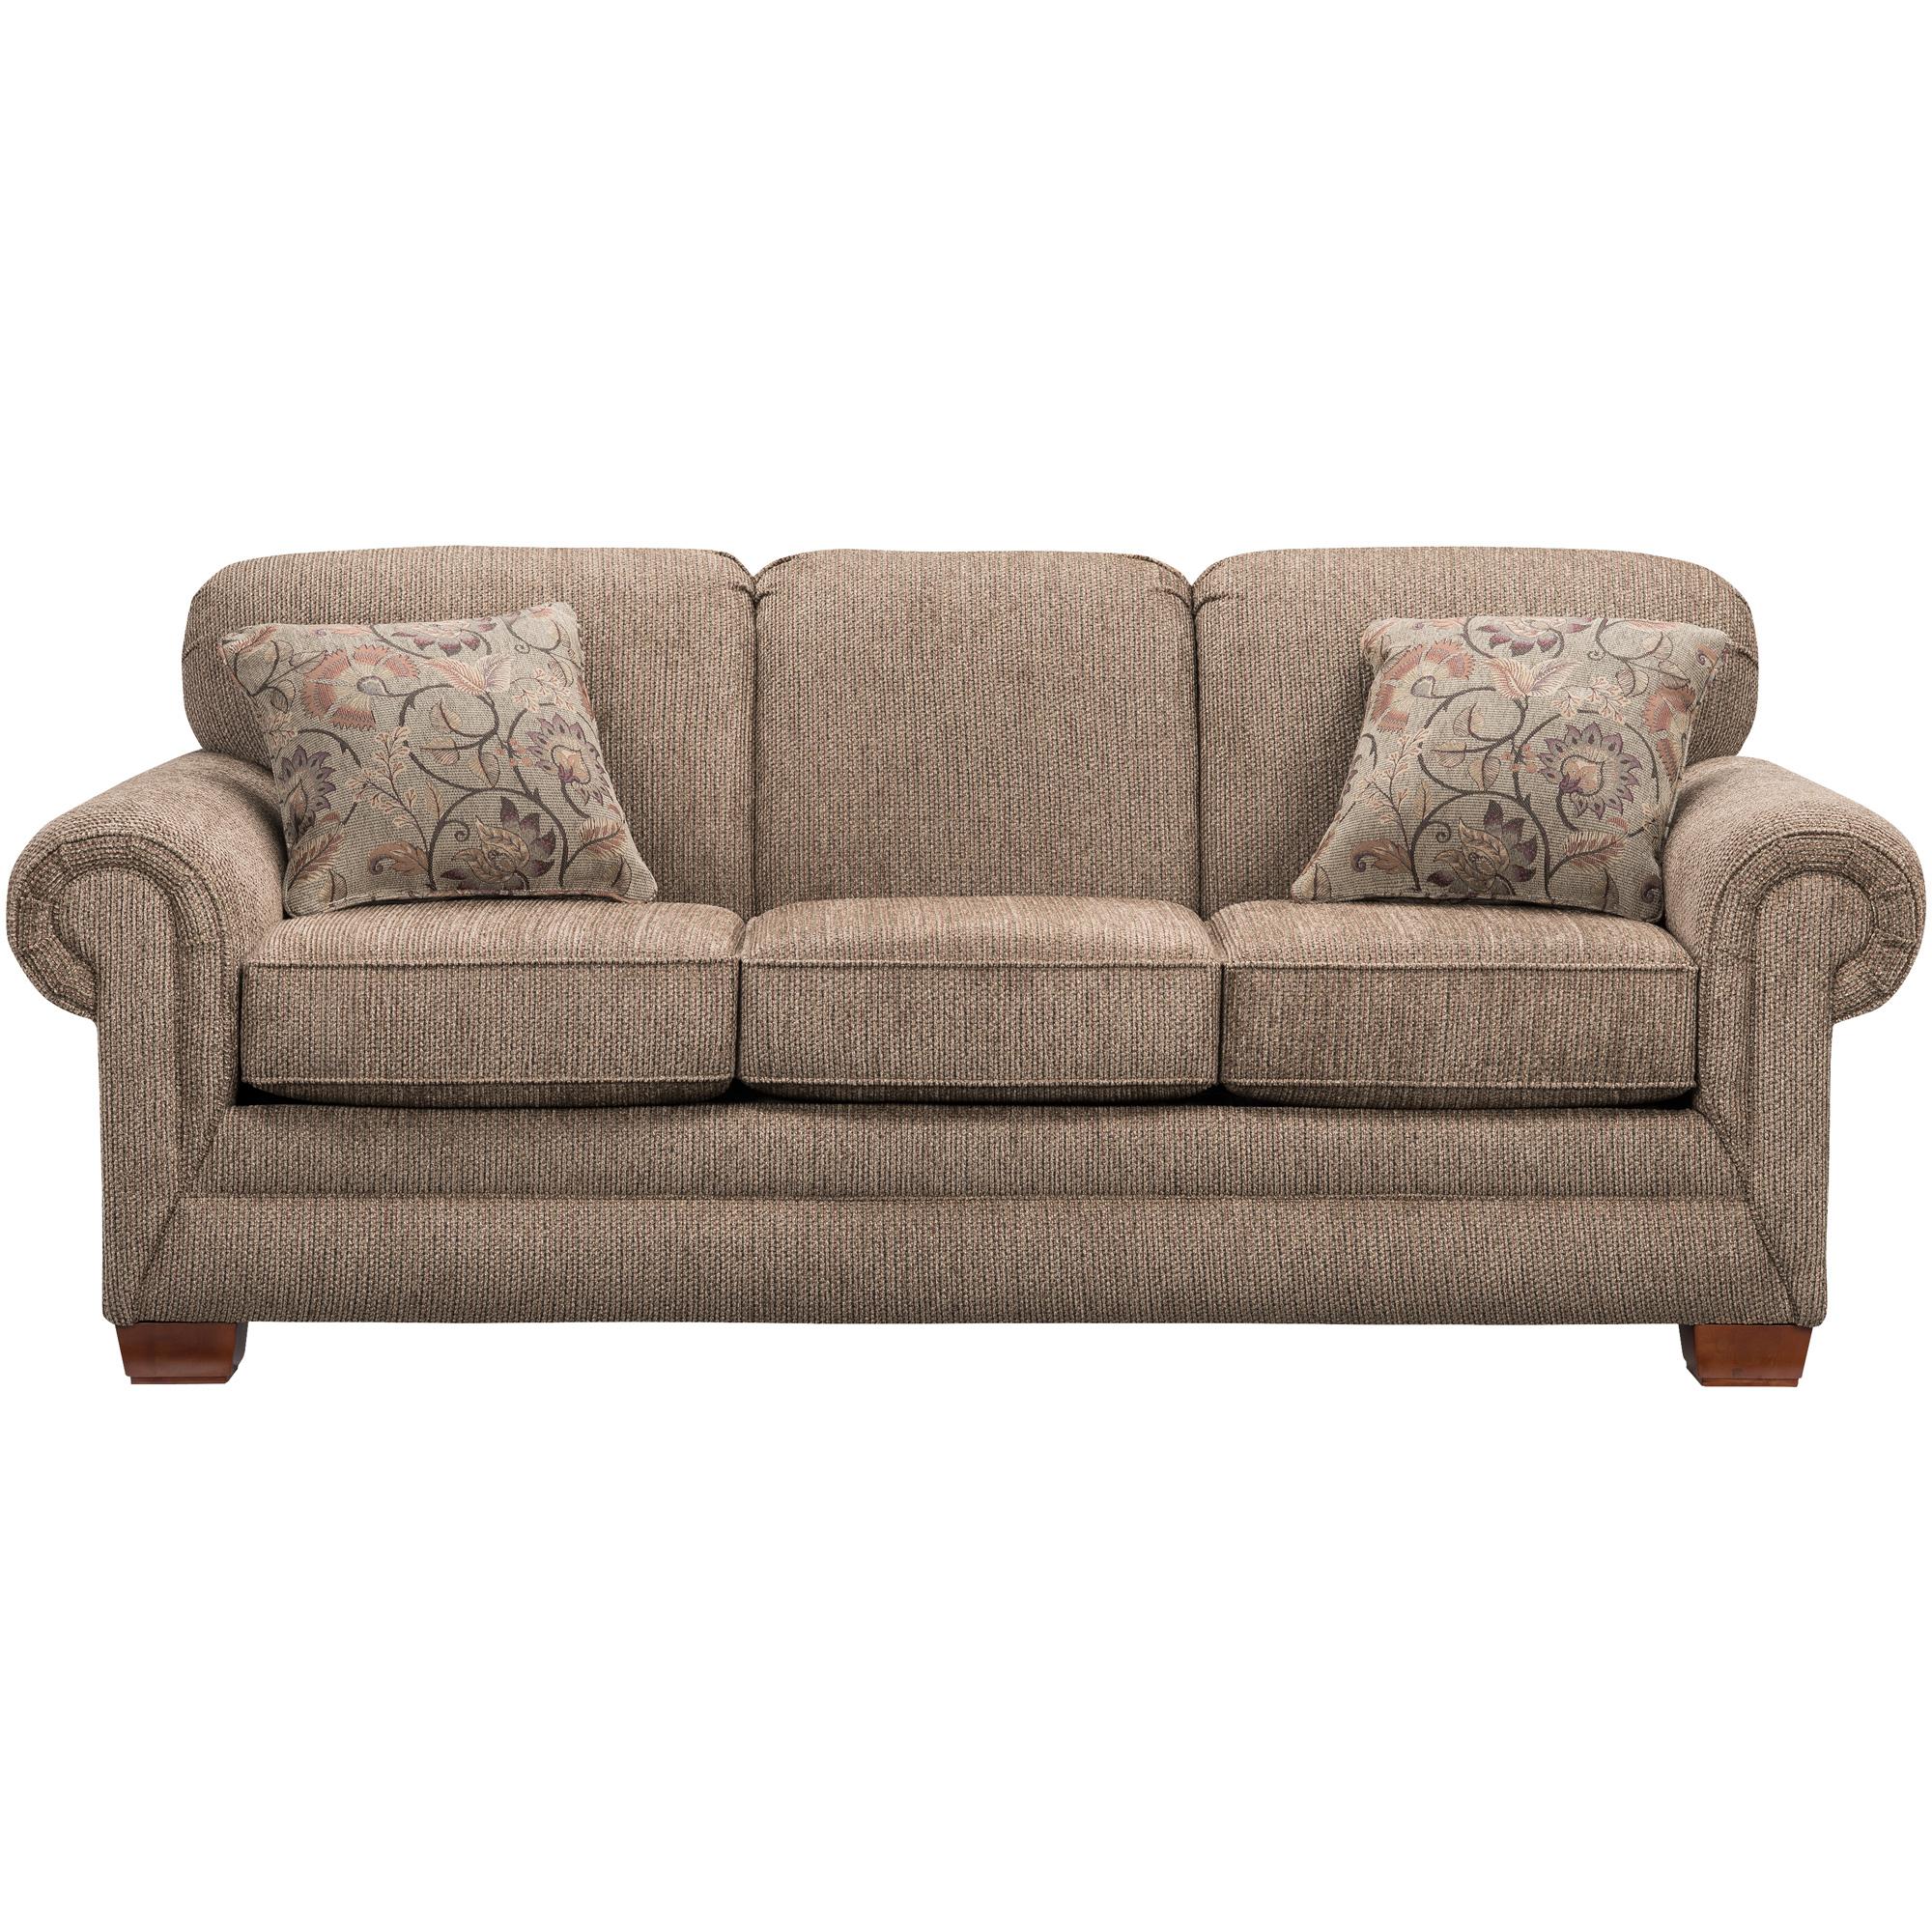 slumberland sofa recliners wooden set cheap harper bed energywarden